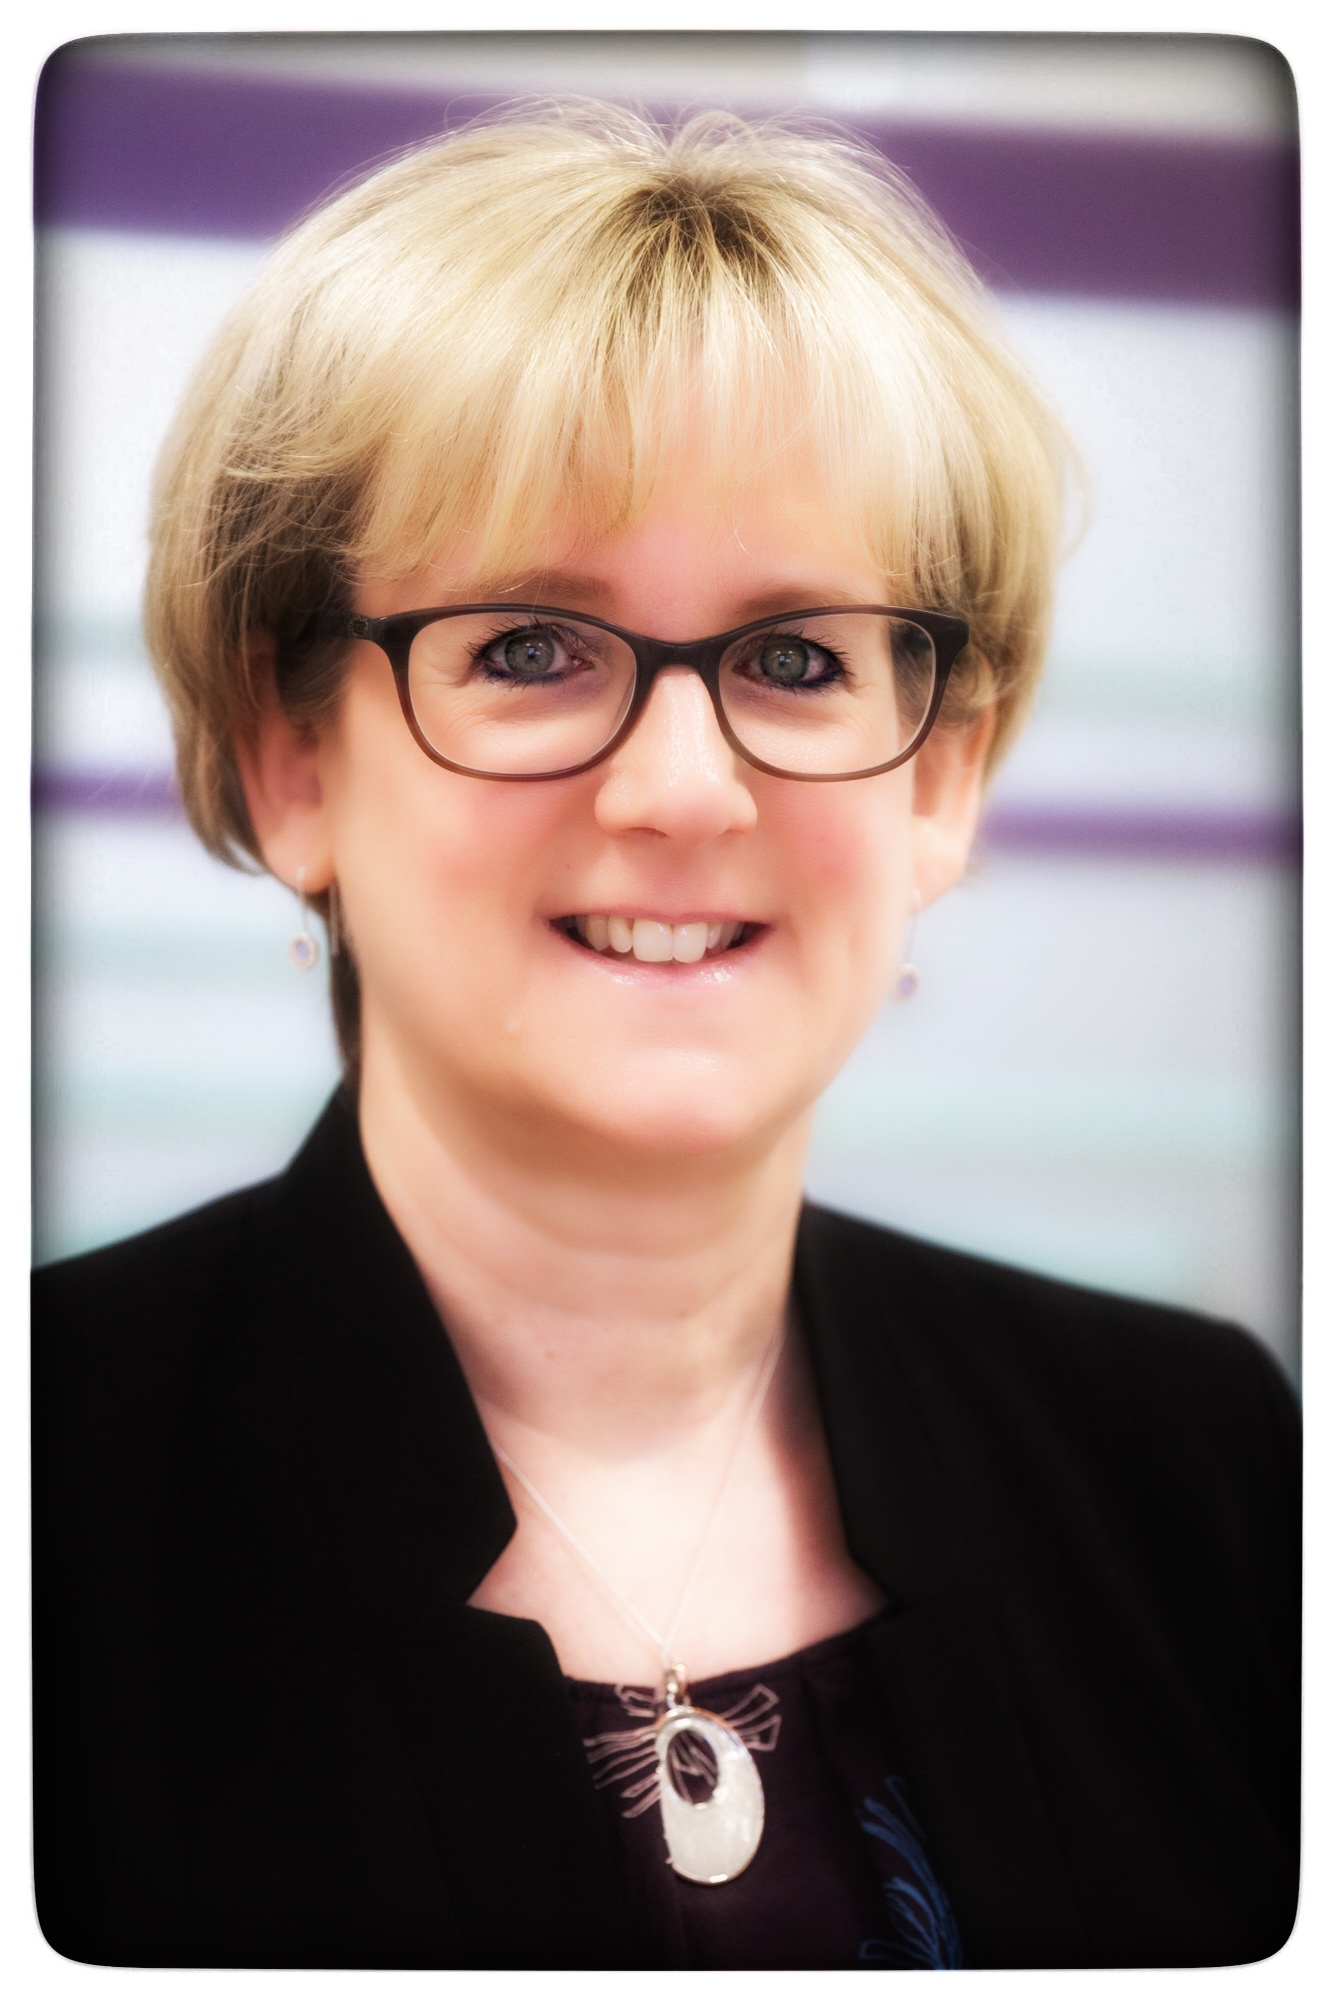 Cheryl Davenport